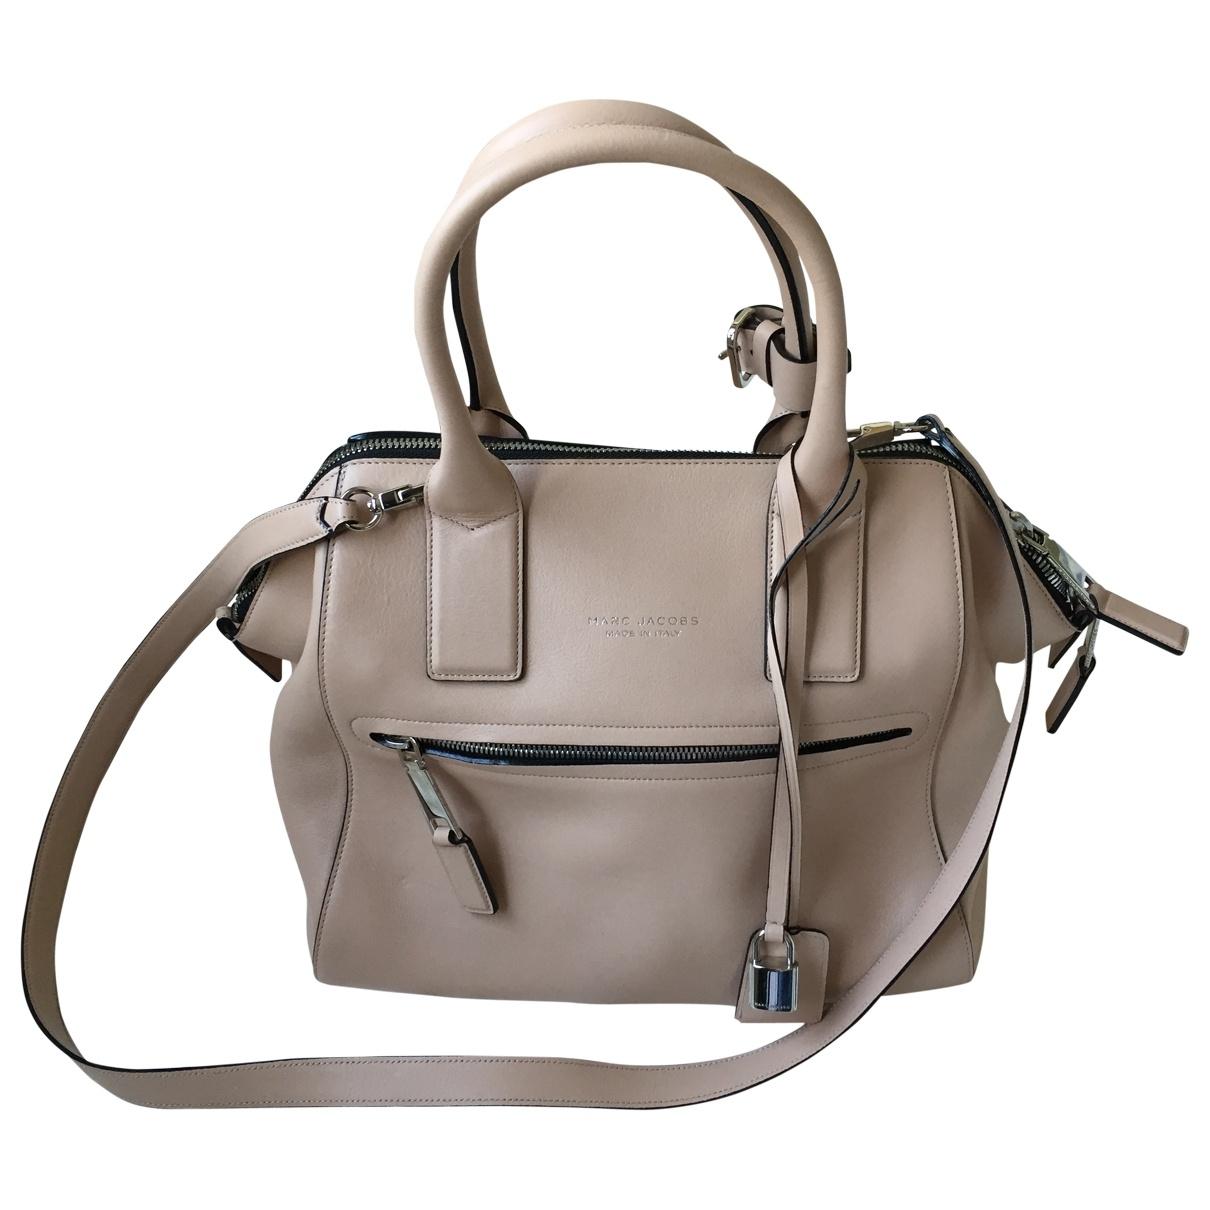 Marc Jacobs \N Handtasche in  Beige Leder